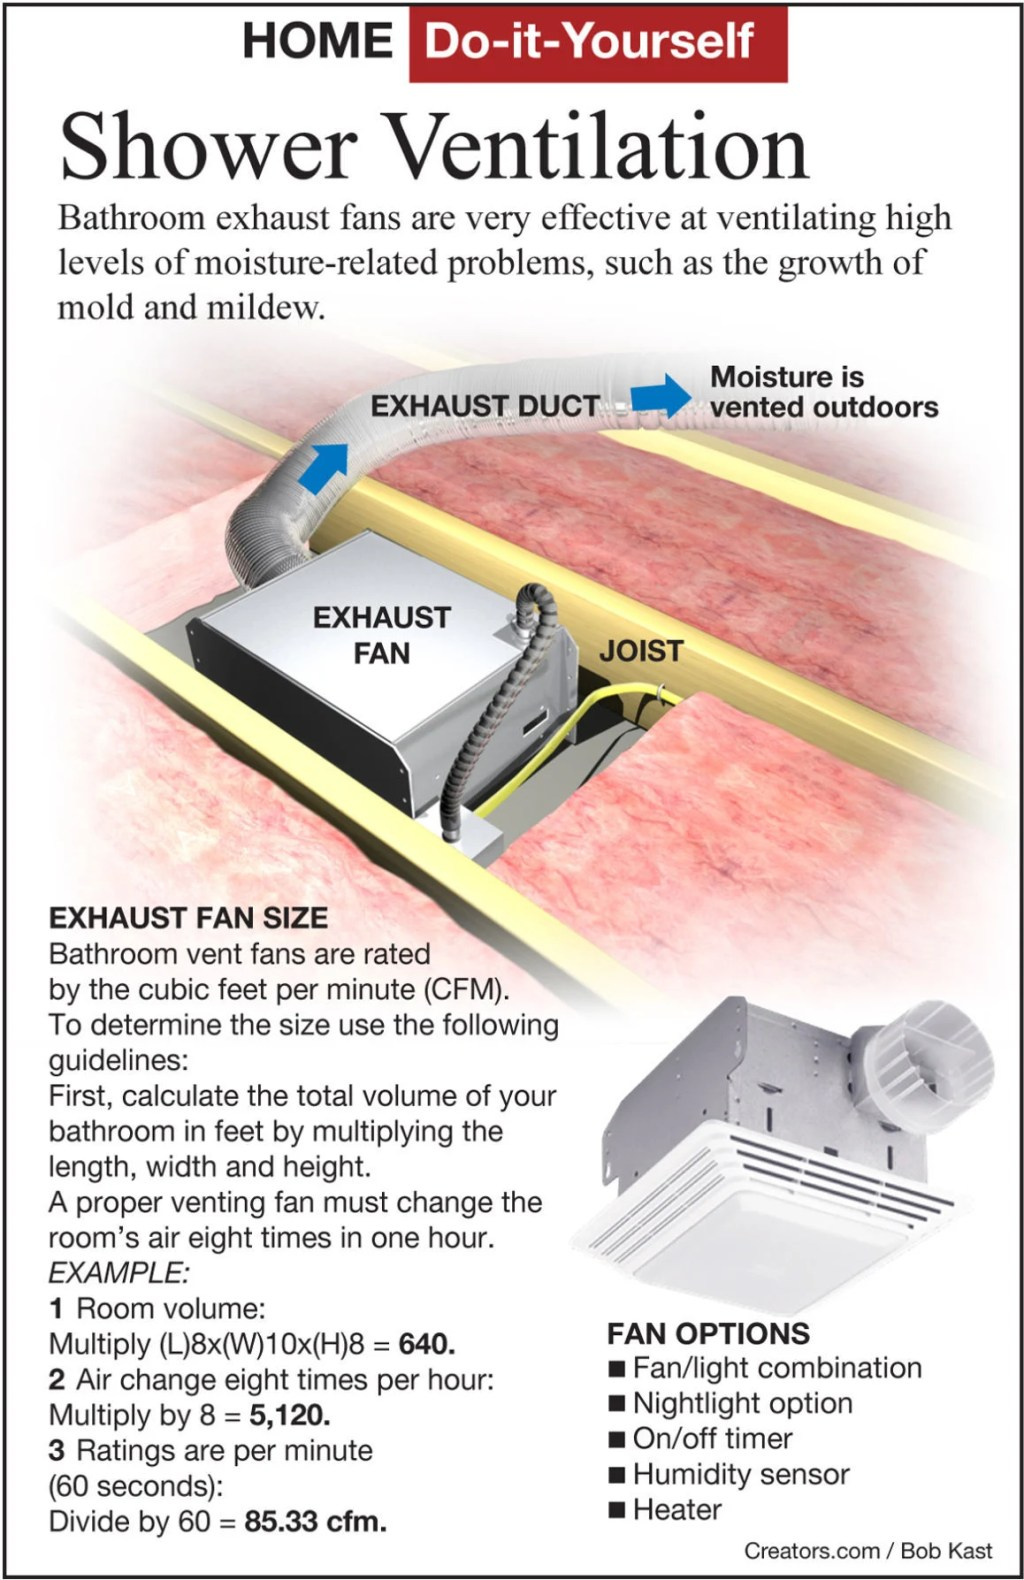 install a new bathroom vent fan light